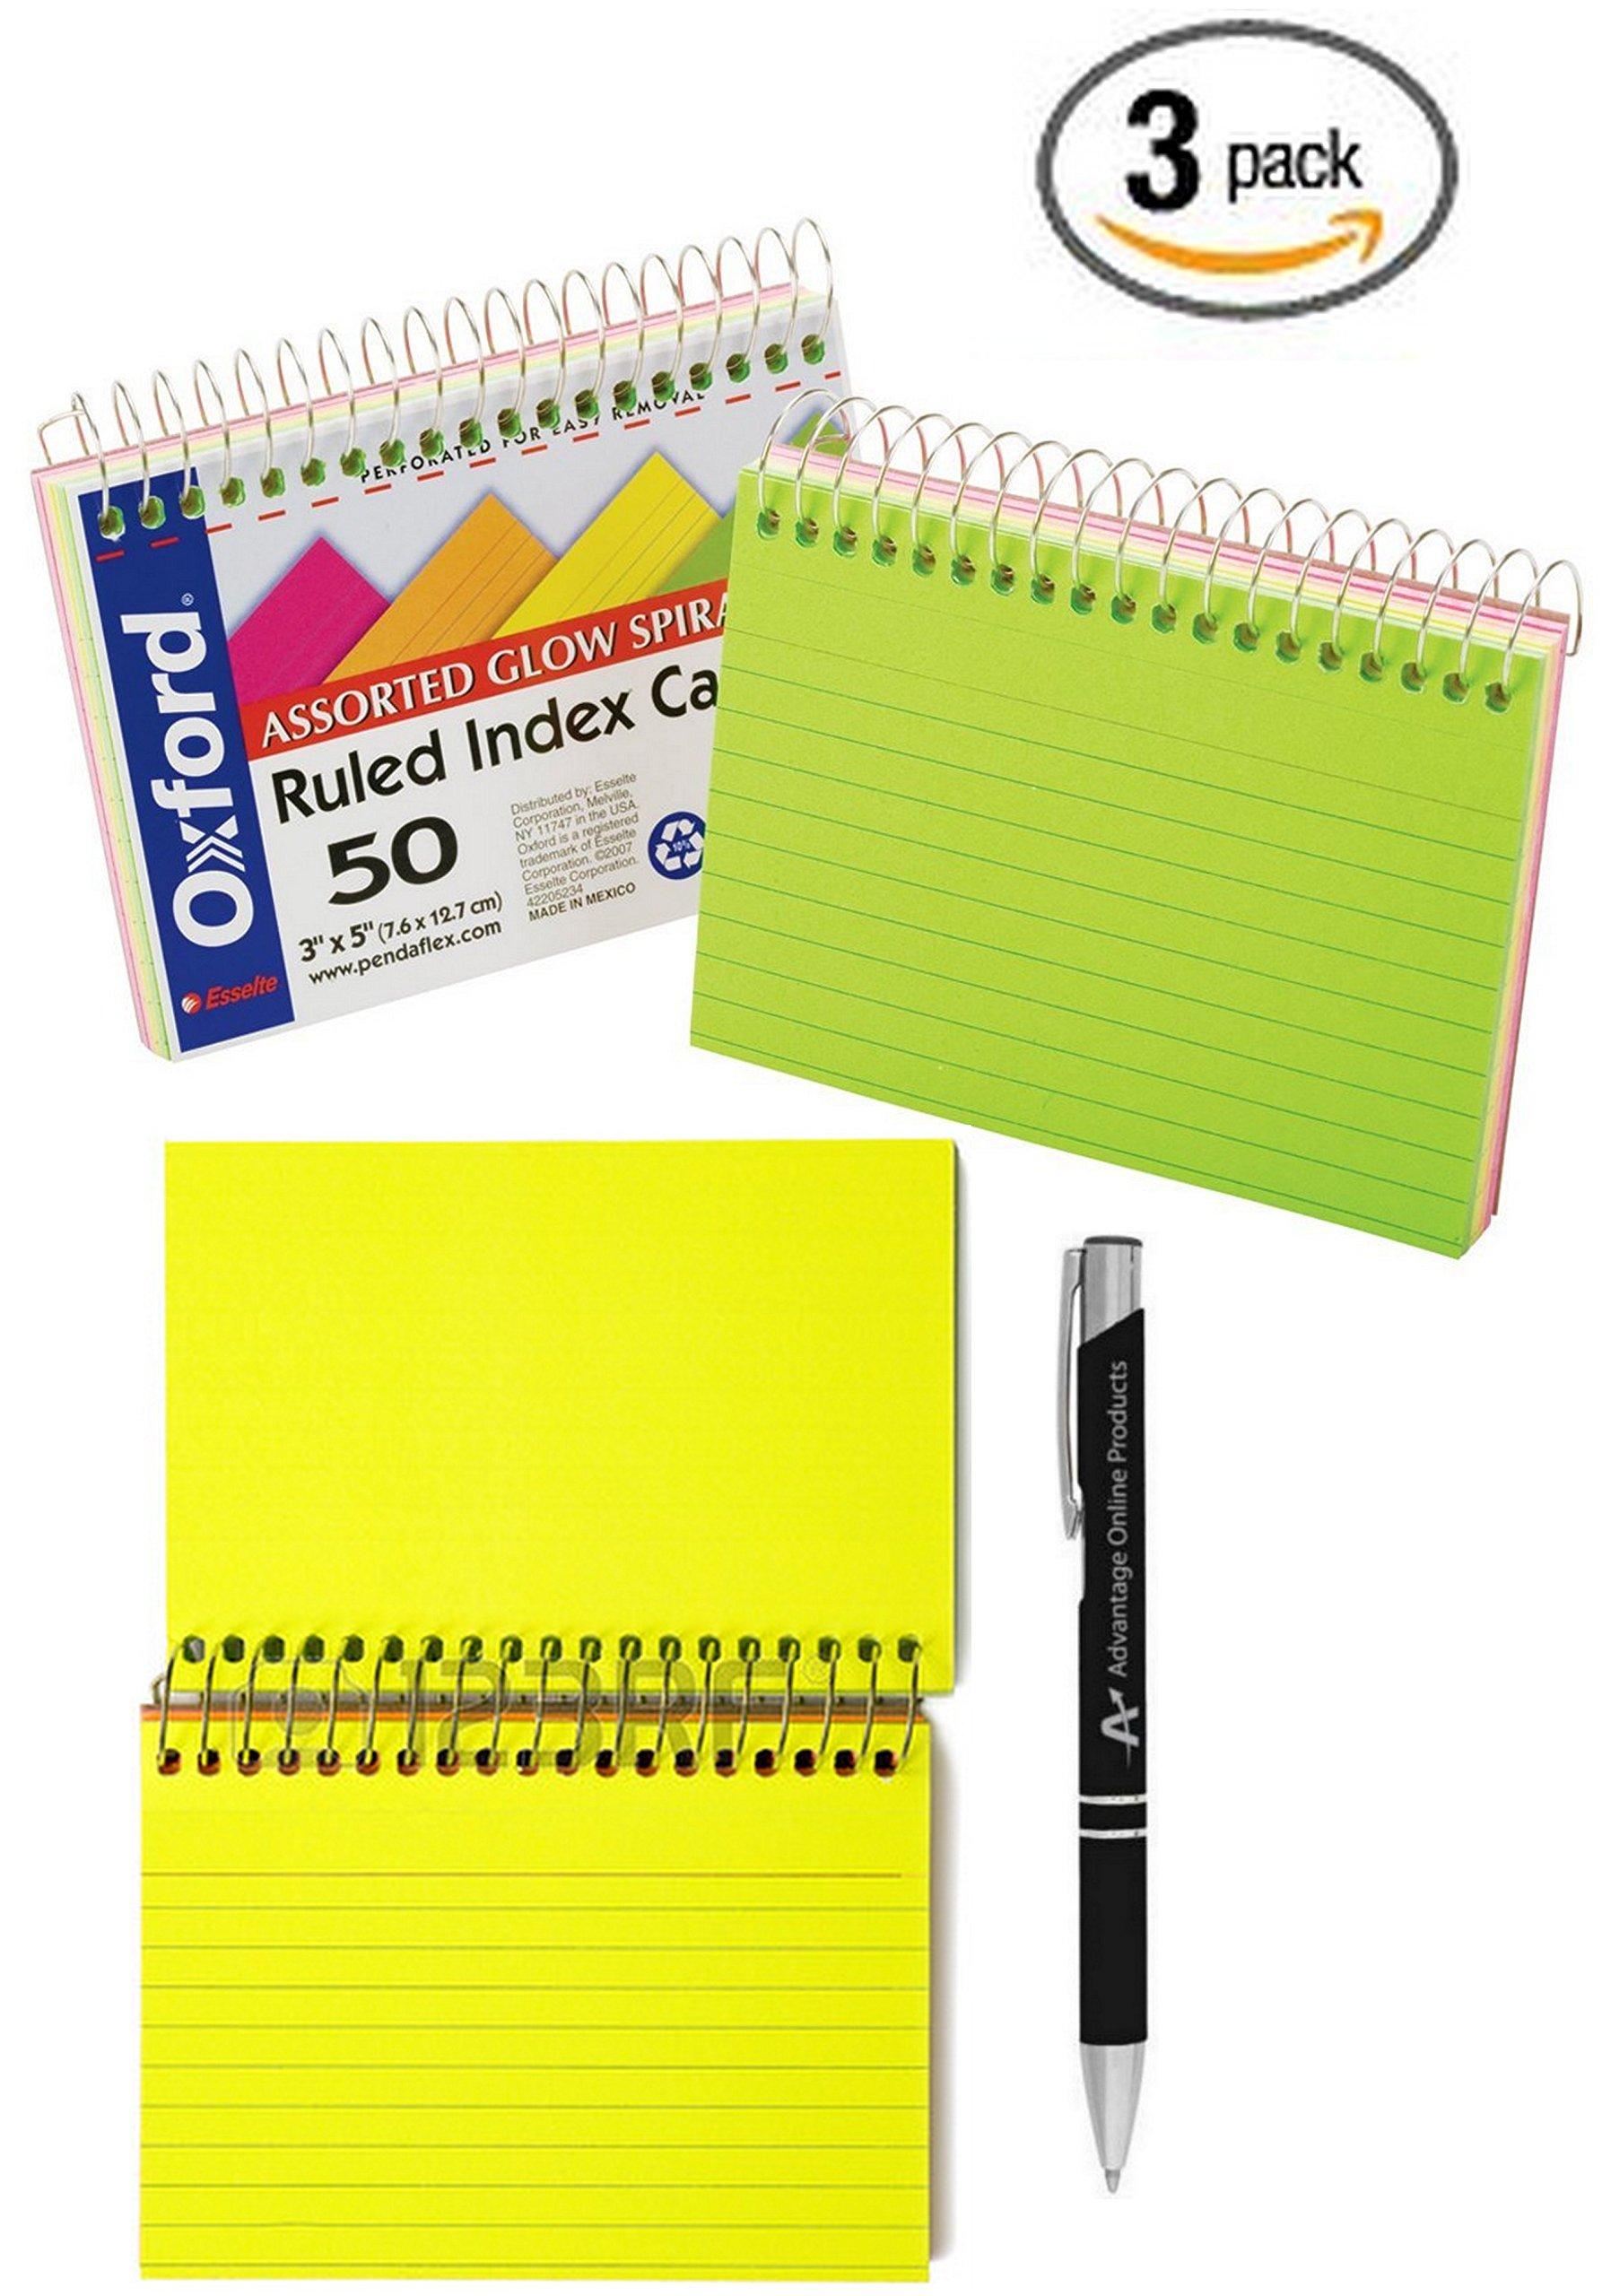 Value Bundle 3-Packs Oxford Spiral Bound Glow Index Cards, 3'' x 5'', Ruled, Asst Bright Colors, 50 Cards per Book (40281) includes Bonus AdvantageOP Black and Chrome Pen (40281x3+P) by Advantage Online Products, LLC (Image #1)